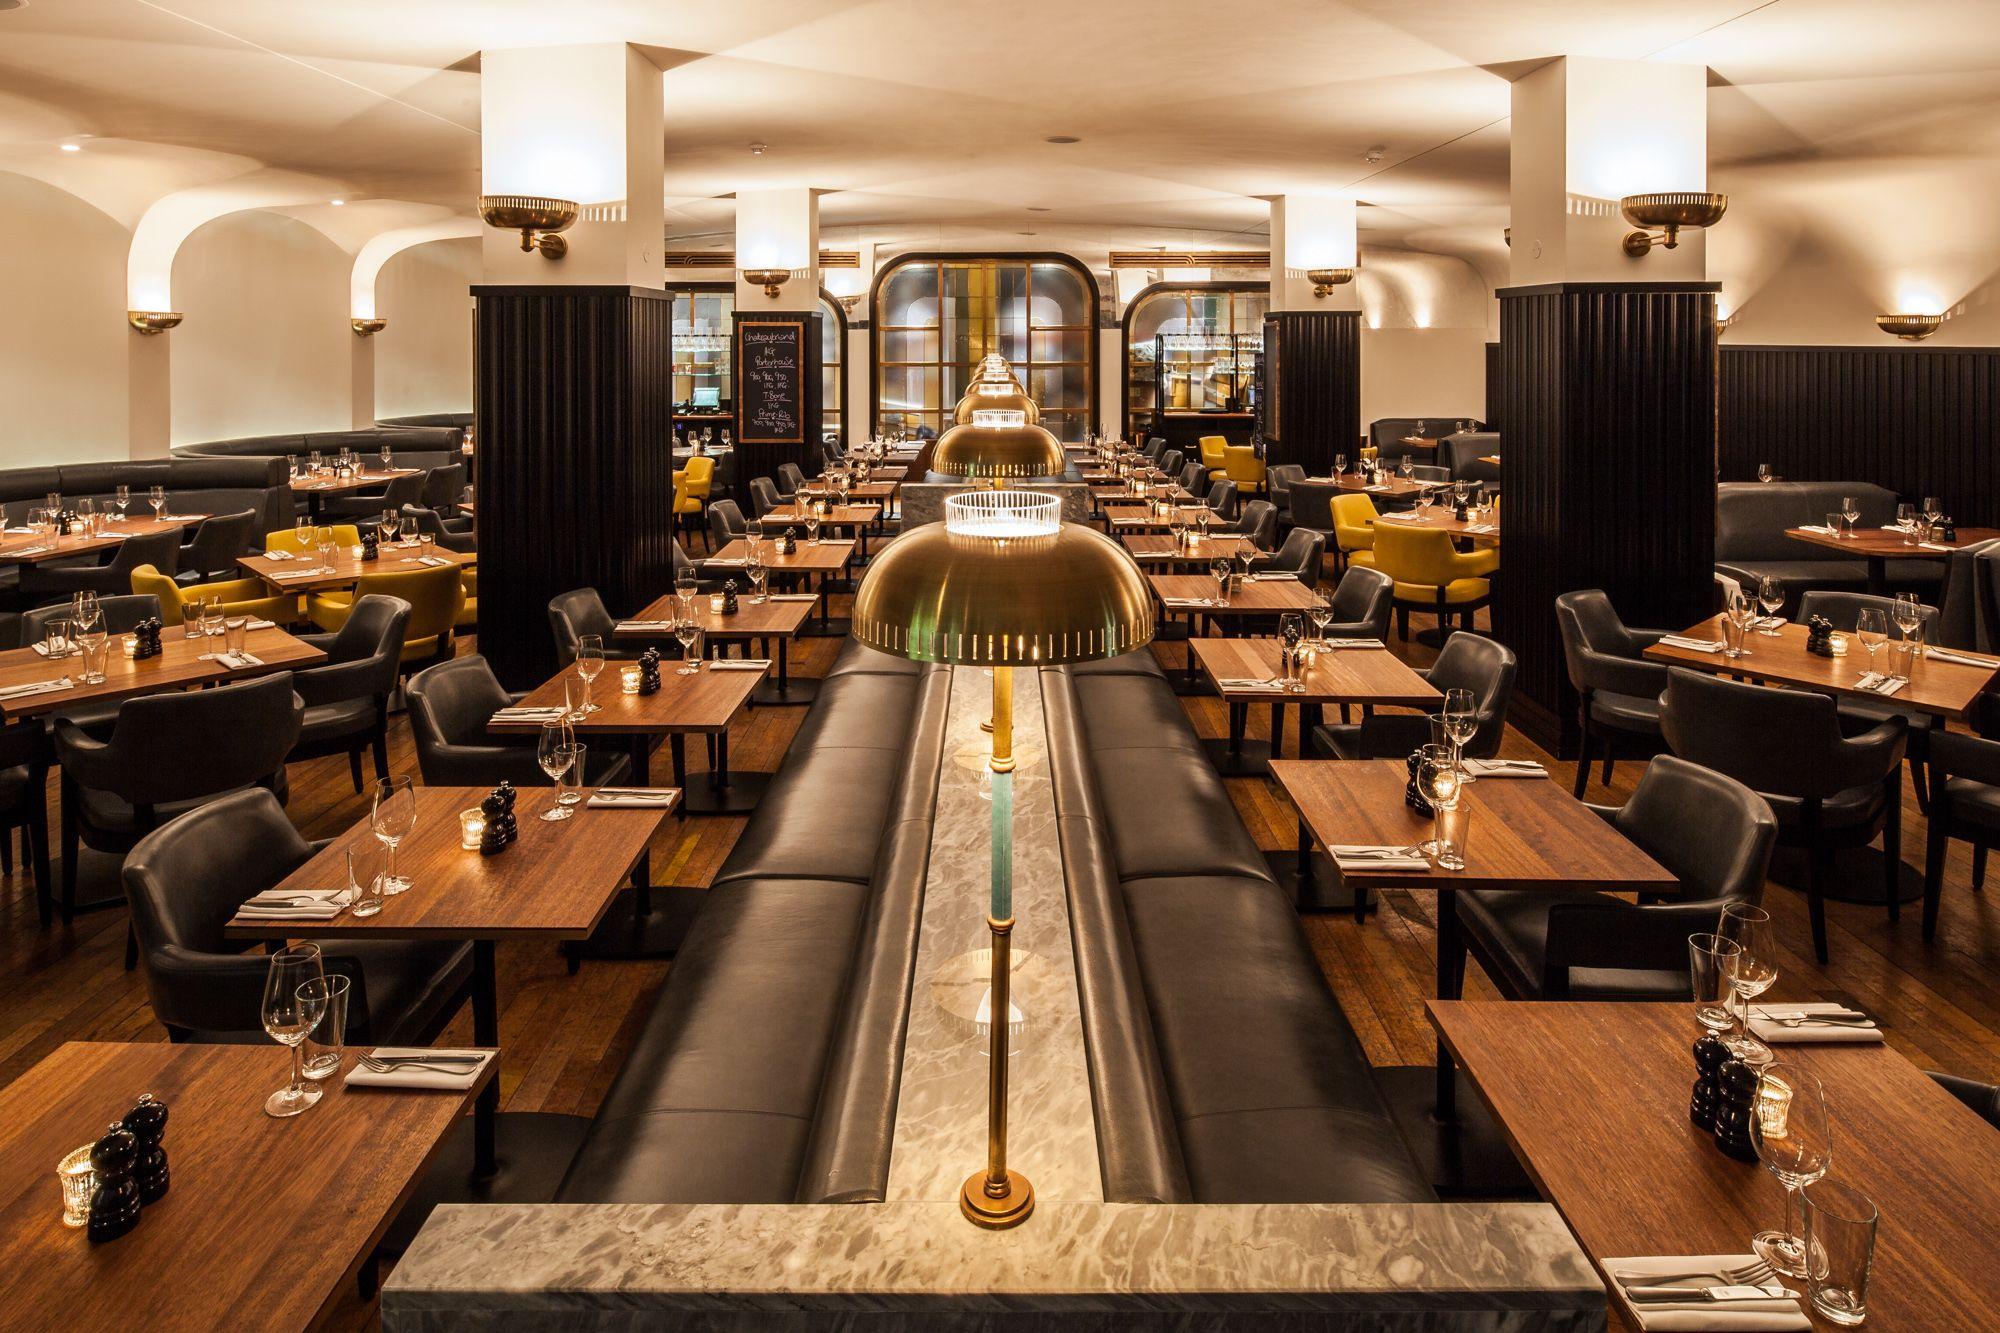 Restaurant Interiors  Hawksmoor Knightsbridge #hawksmoor #knightsbridge  #london #hawksmoorknightsbridge #steak